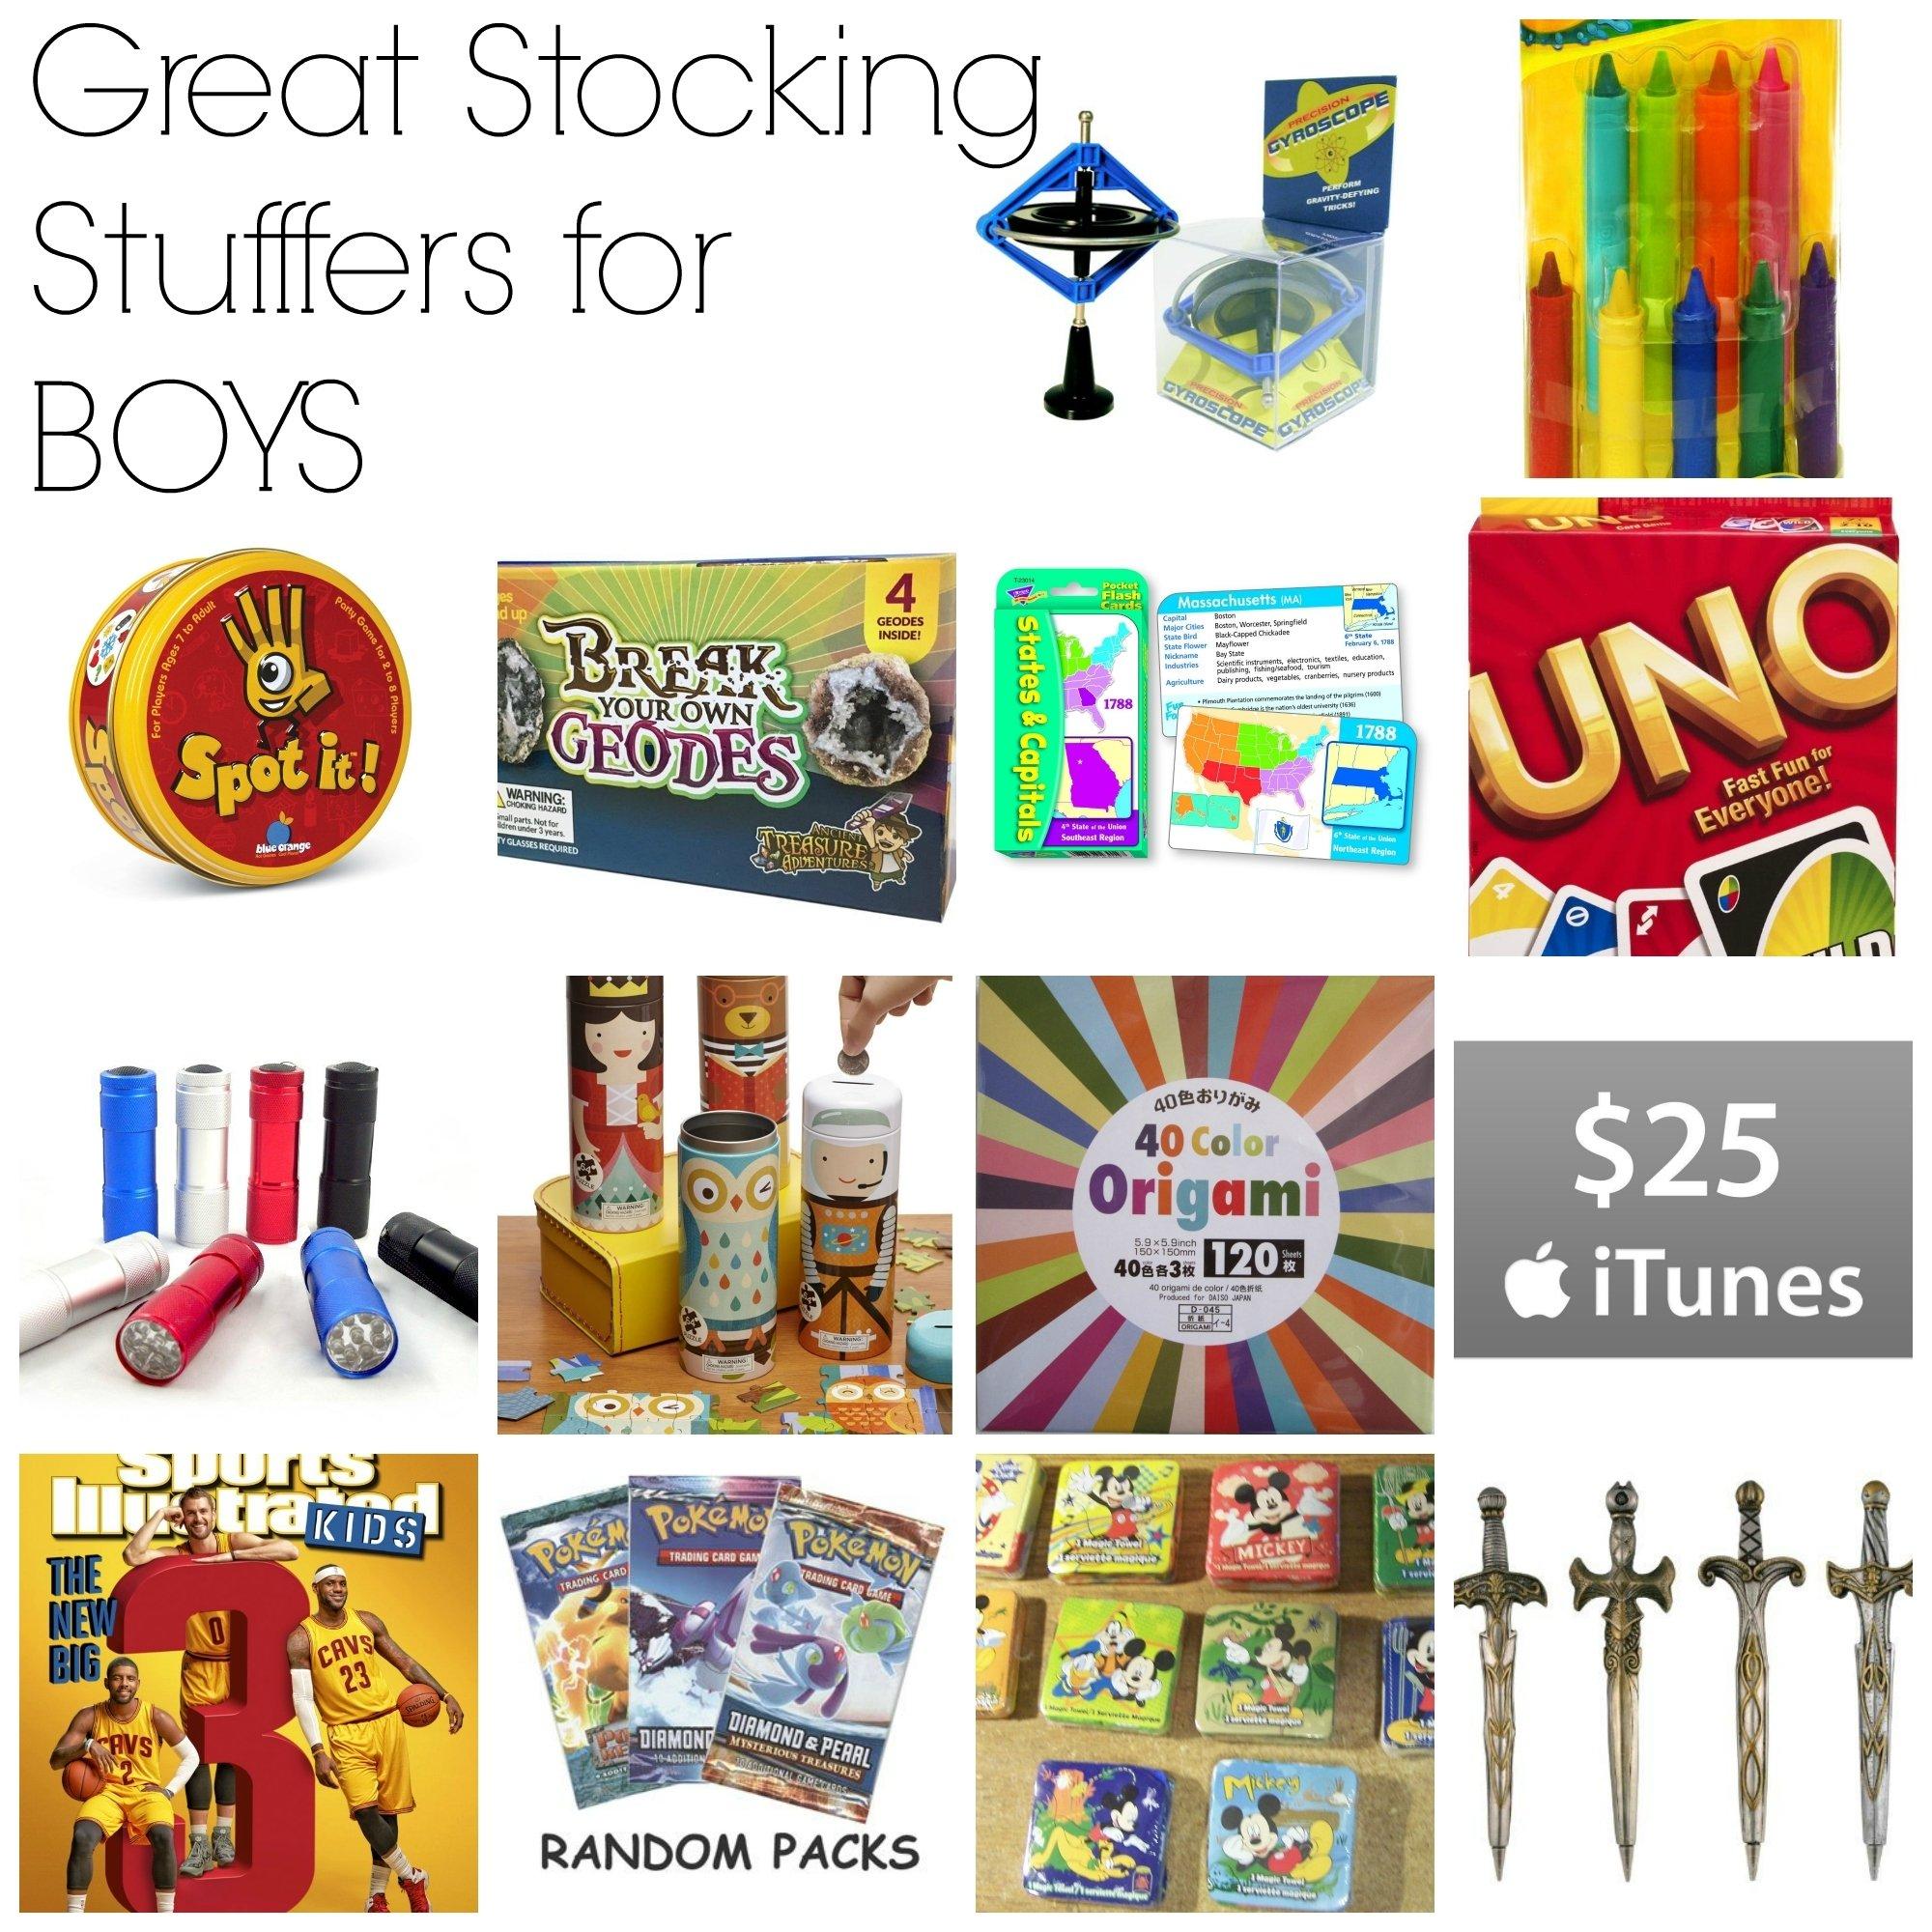 10 Nice Christmas Stocking Ideas For Kids great stocking stuffers for boys brooke romney writes 2020